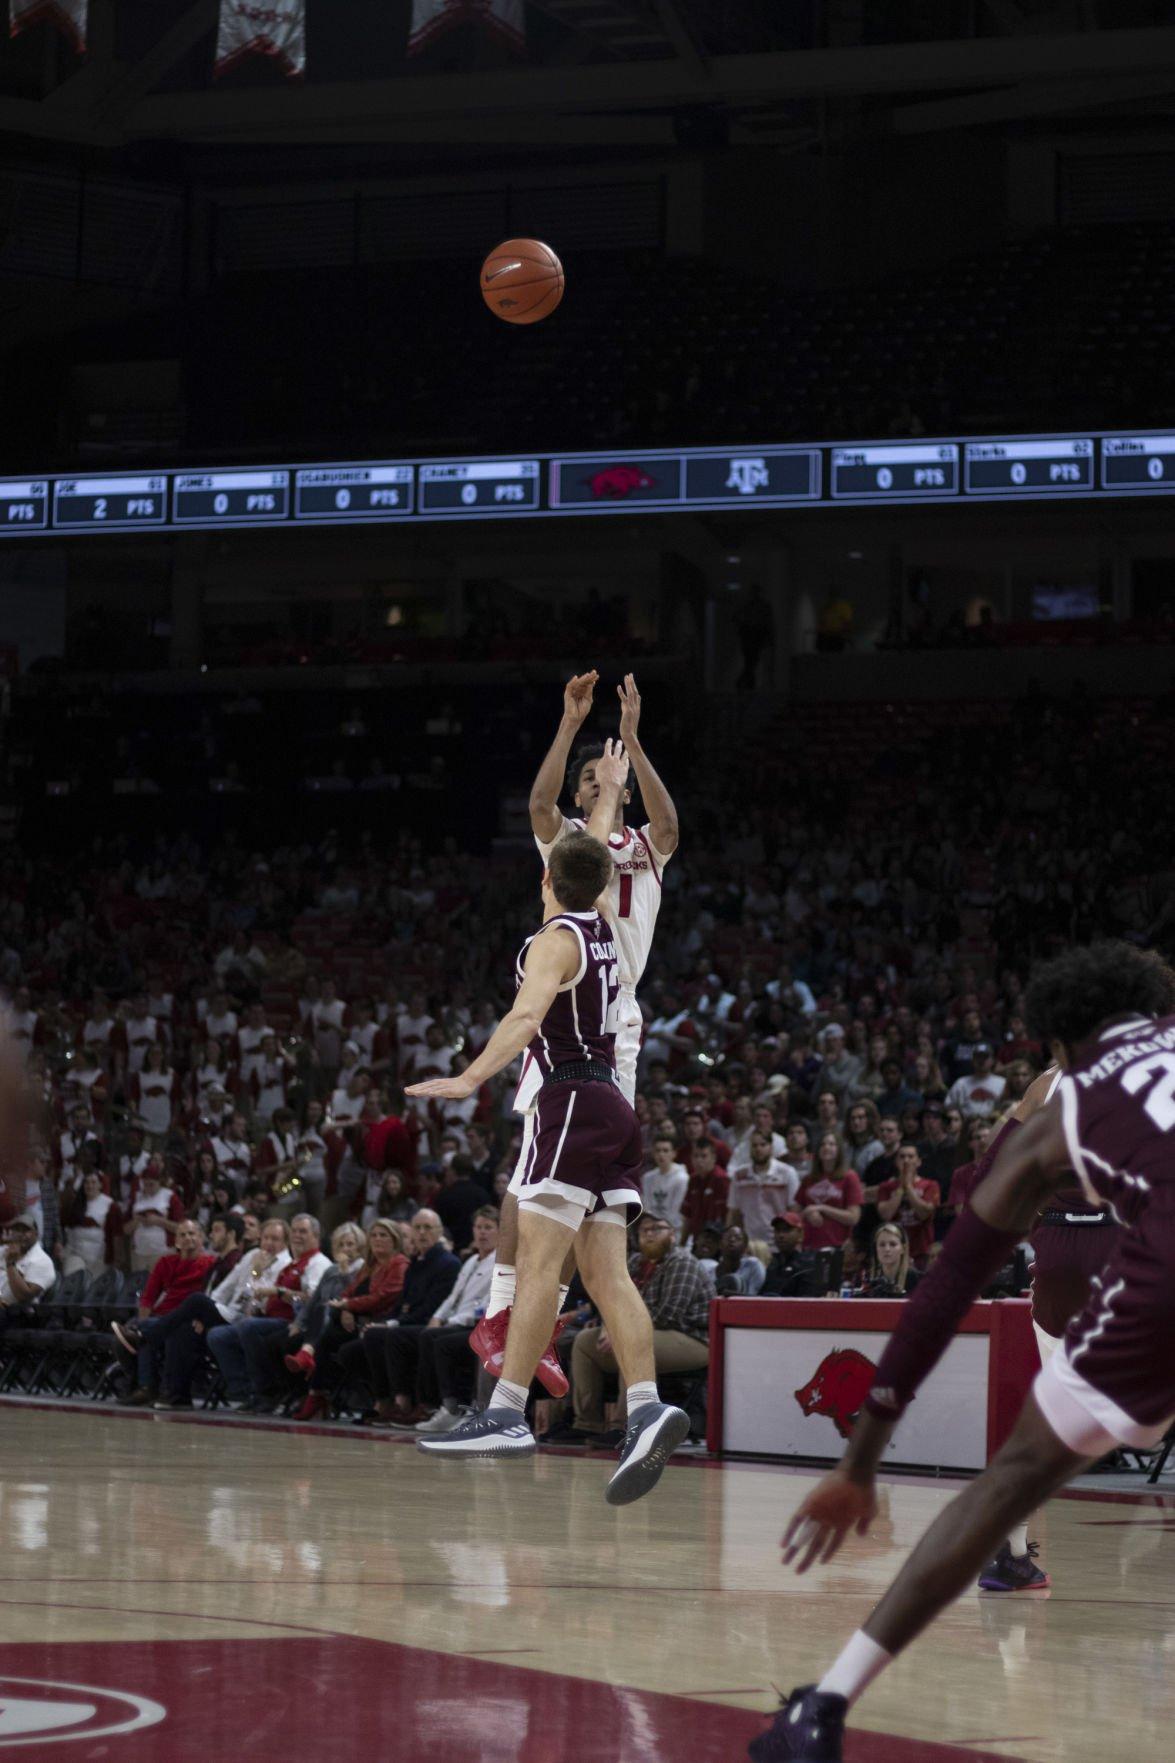 Basketball vs texas a_m-2.jpg